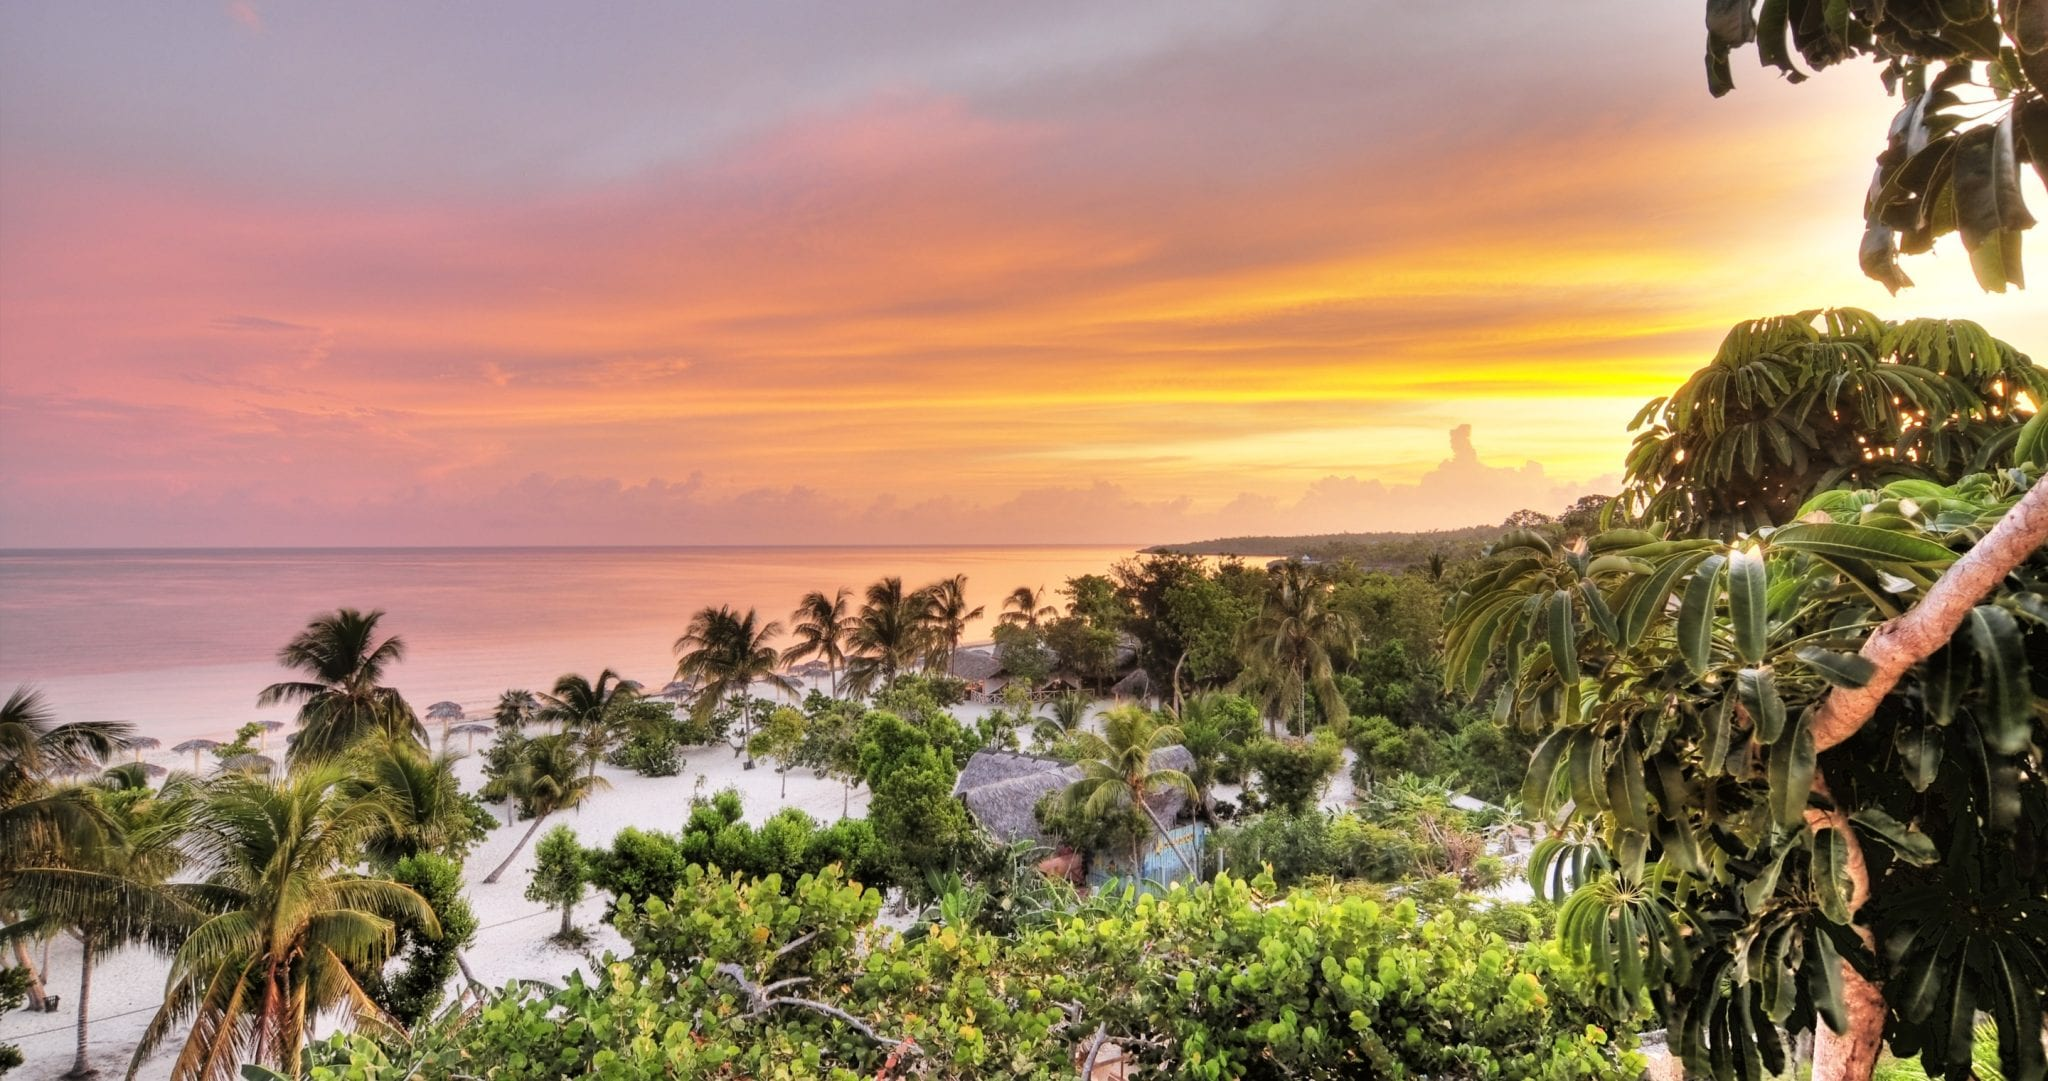 Tropenparadies Kuba